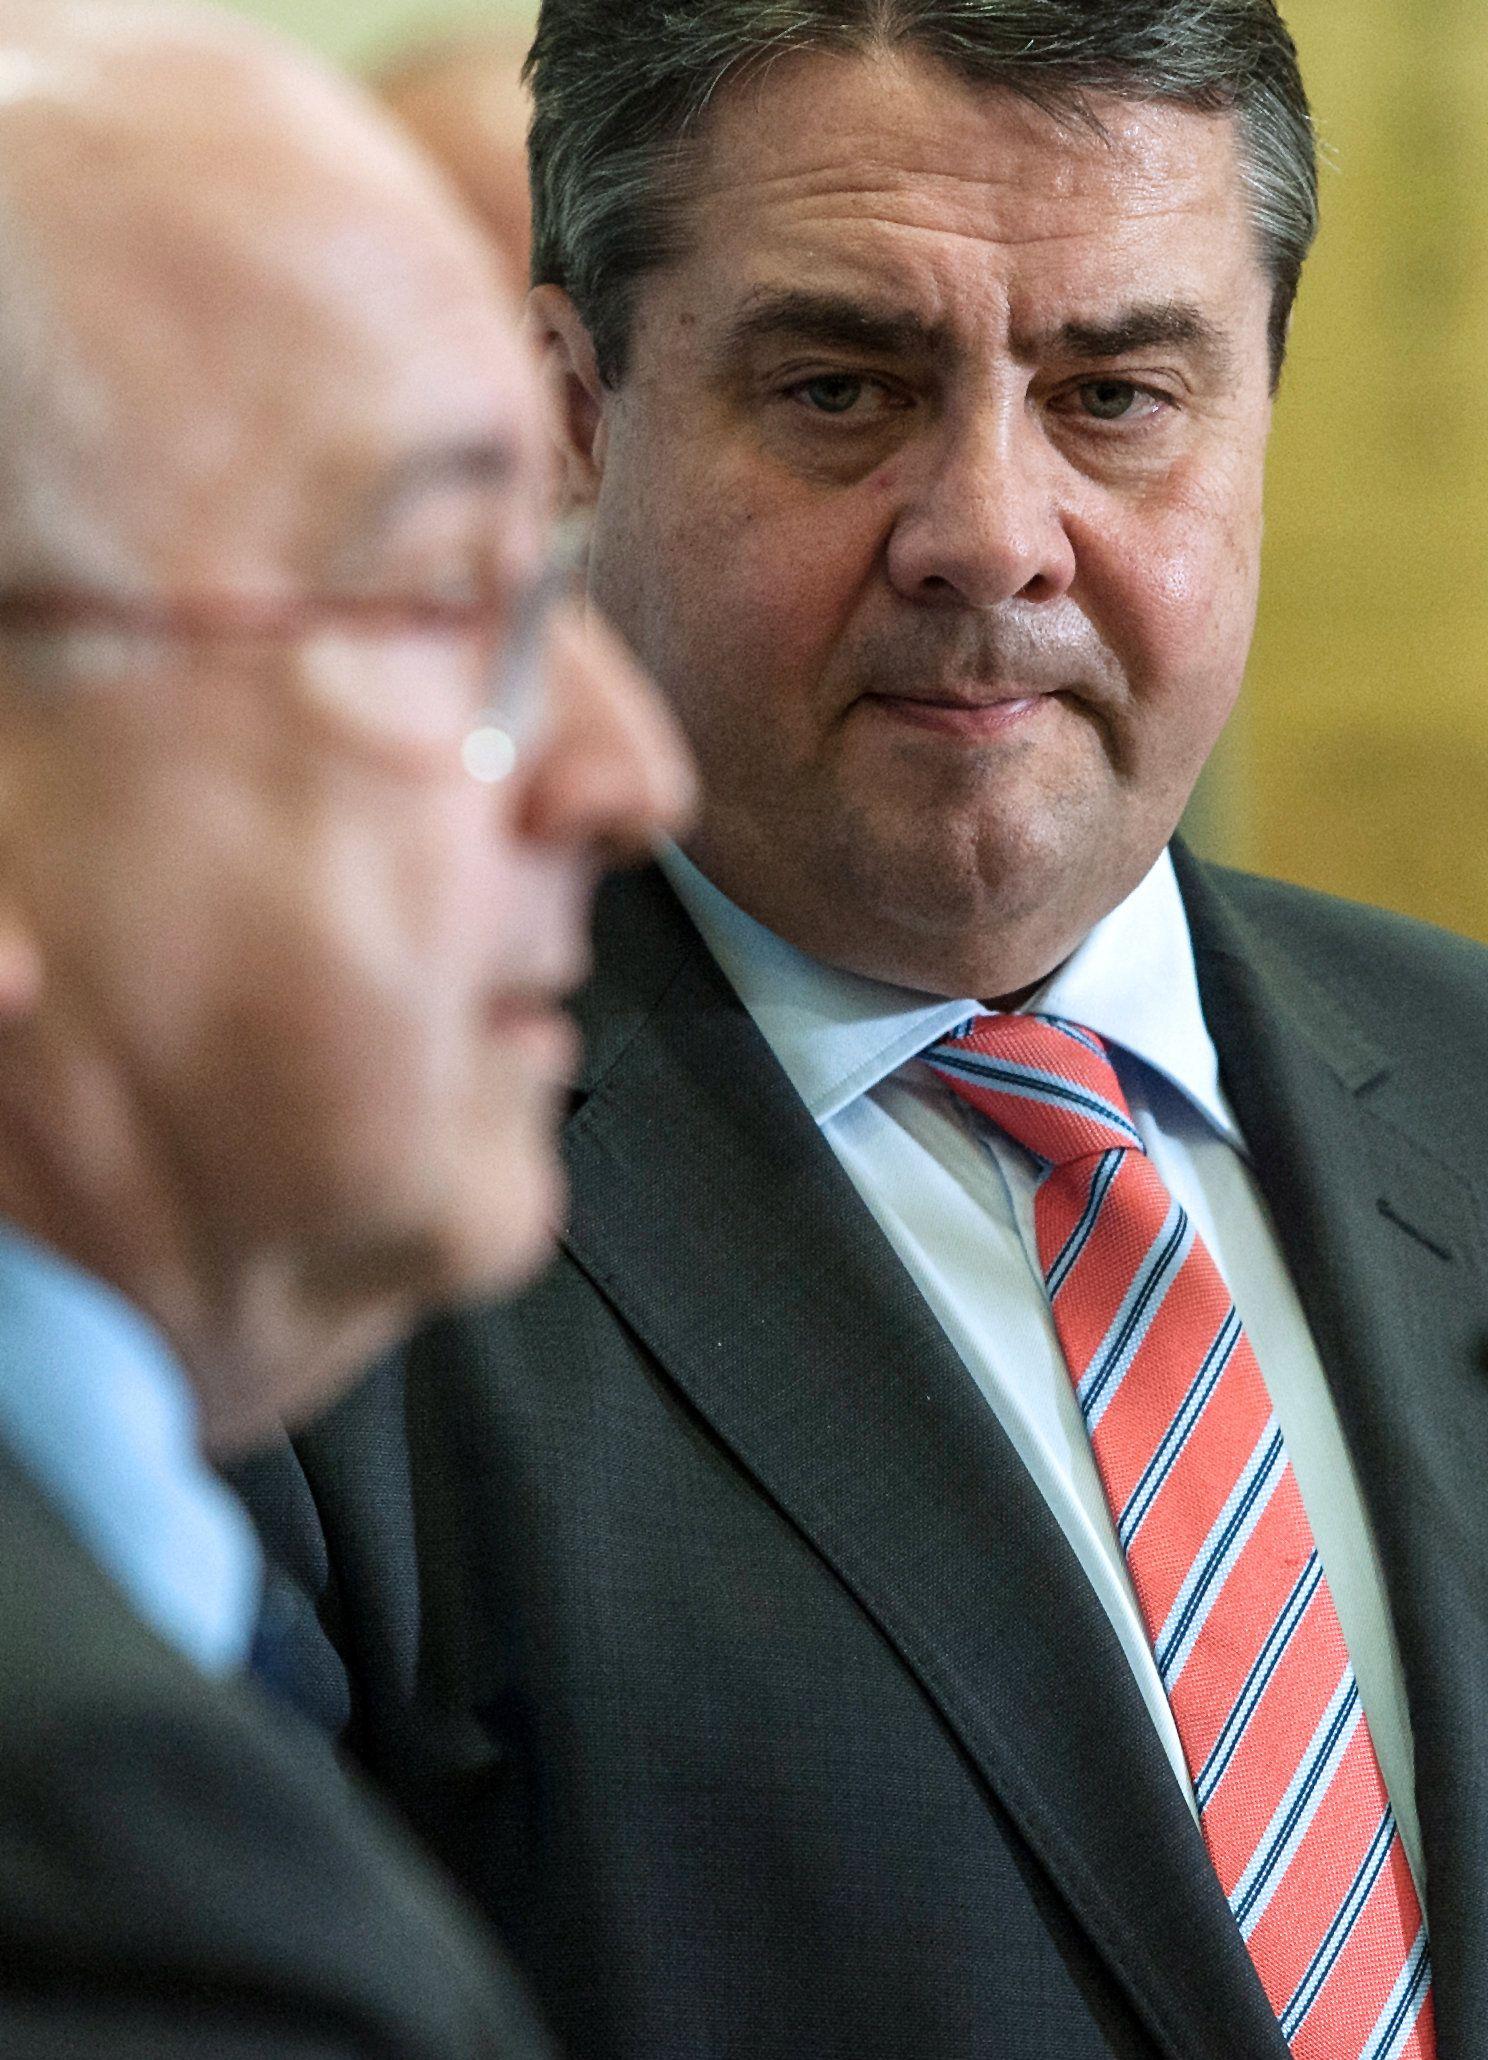 Gabriel empfängt EU-Kommissar Almunia